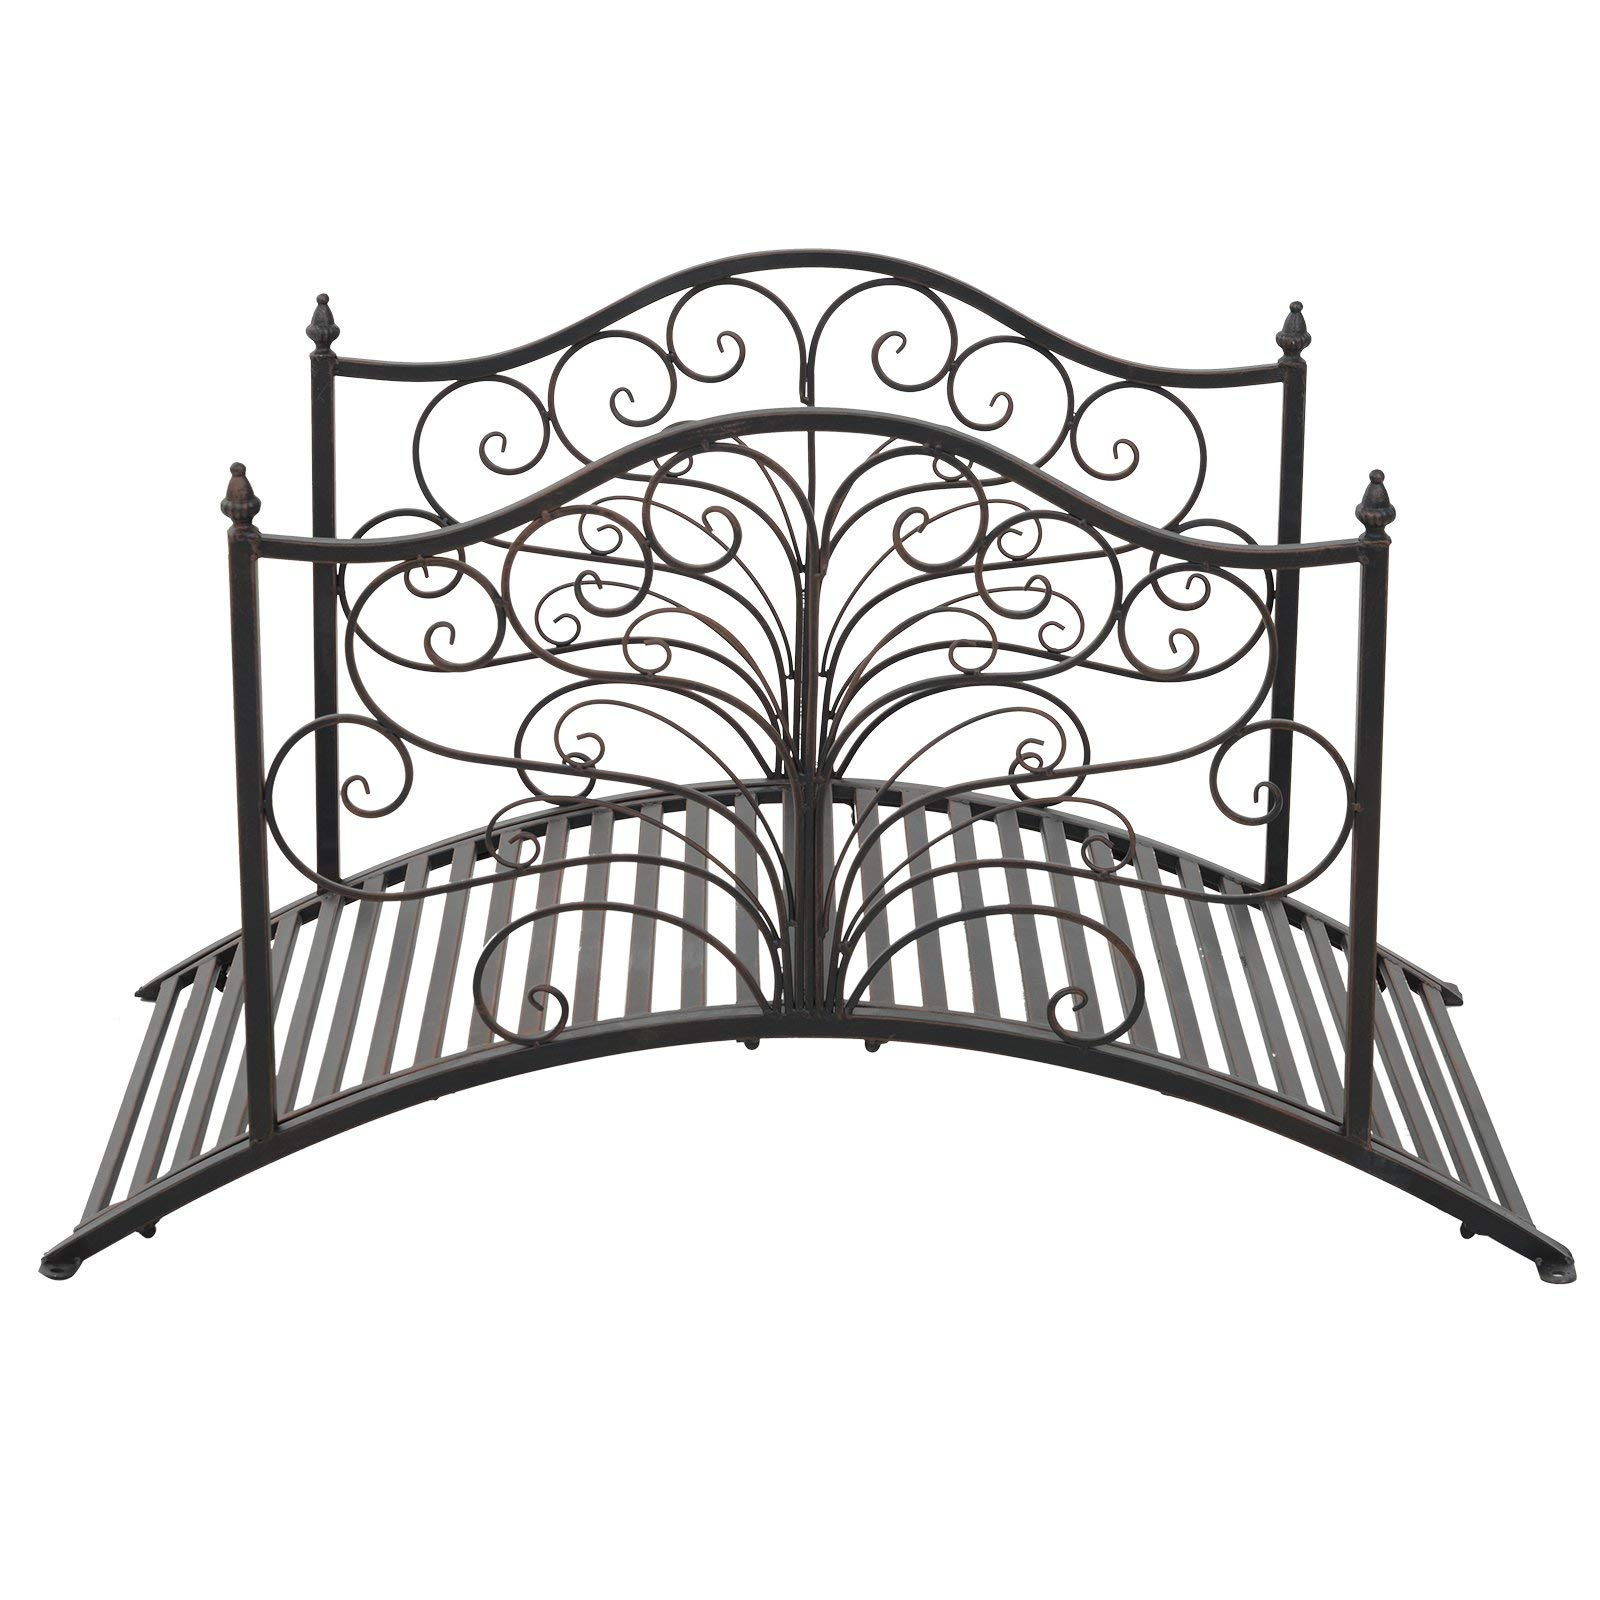 Festnight Outdoor Metal Garden Bridge Patio Backyard Decorative Bridge Black Bronze, 4' by Festnight (Image #3)